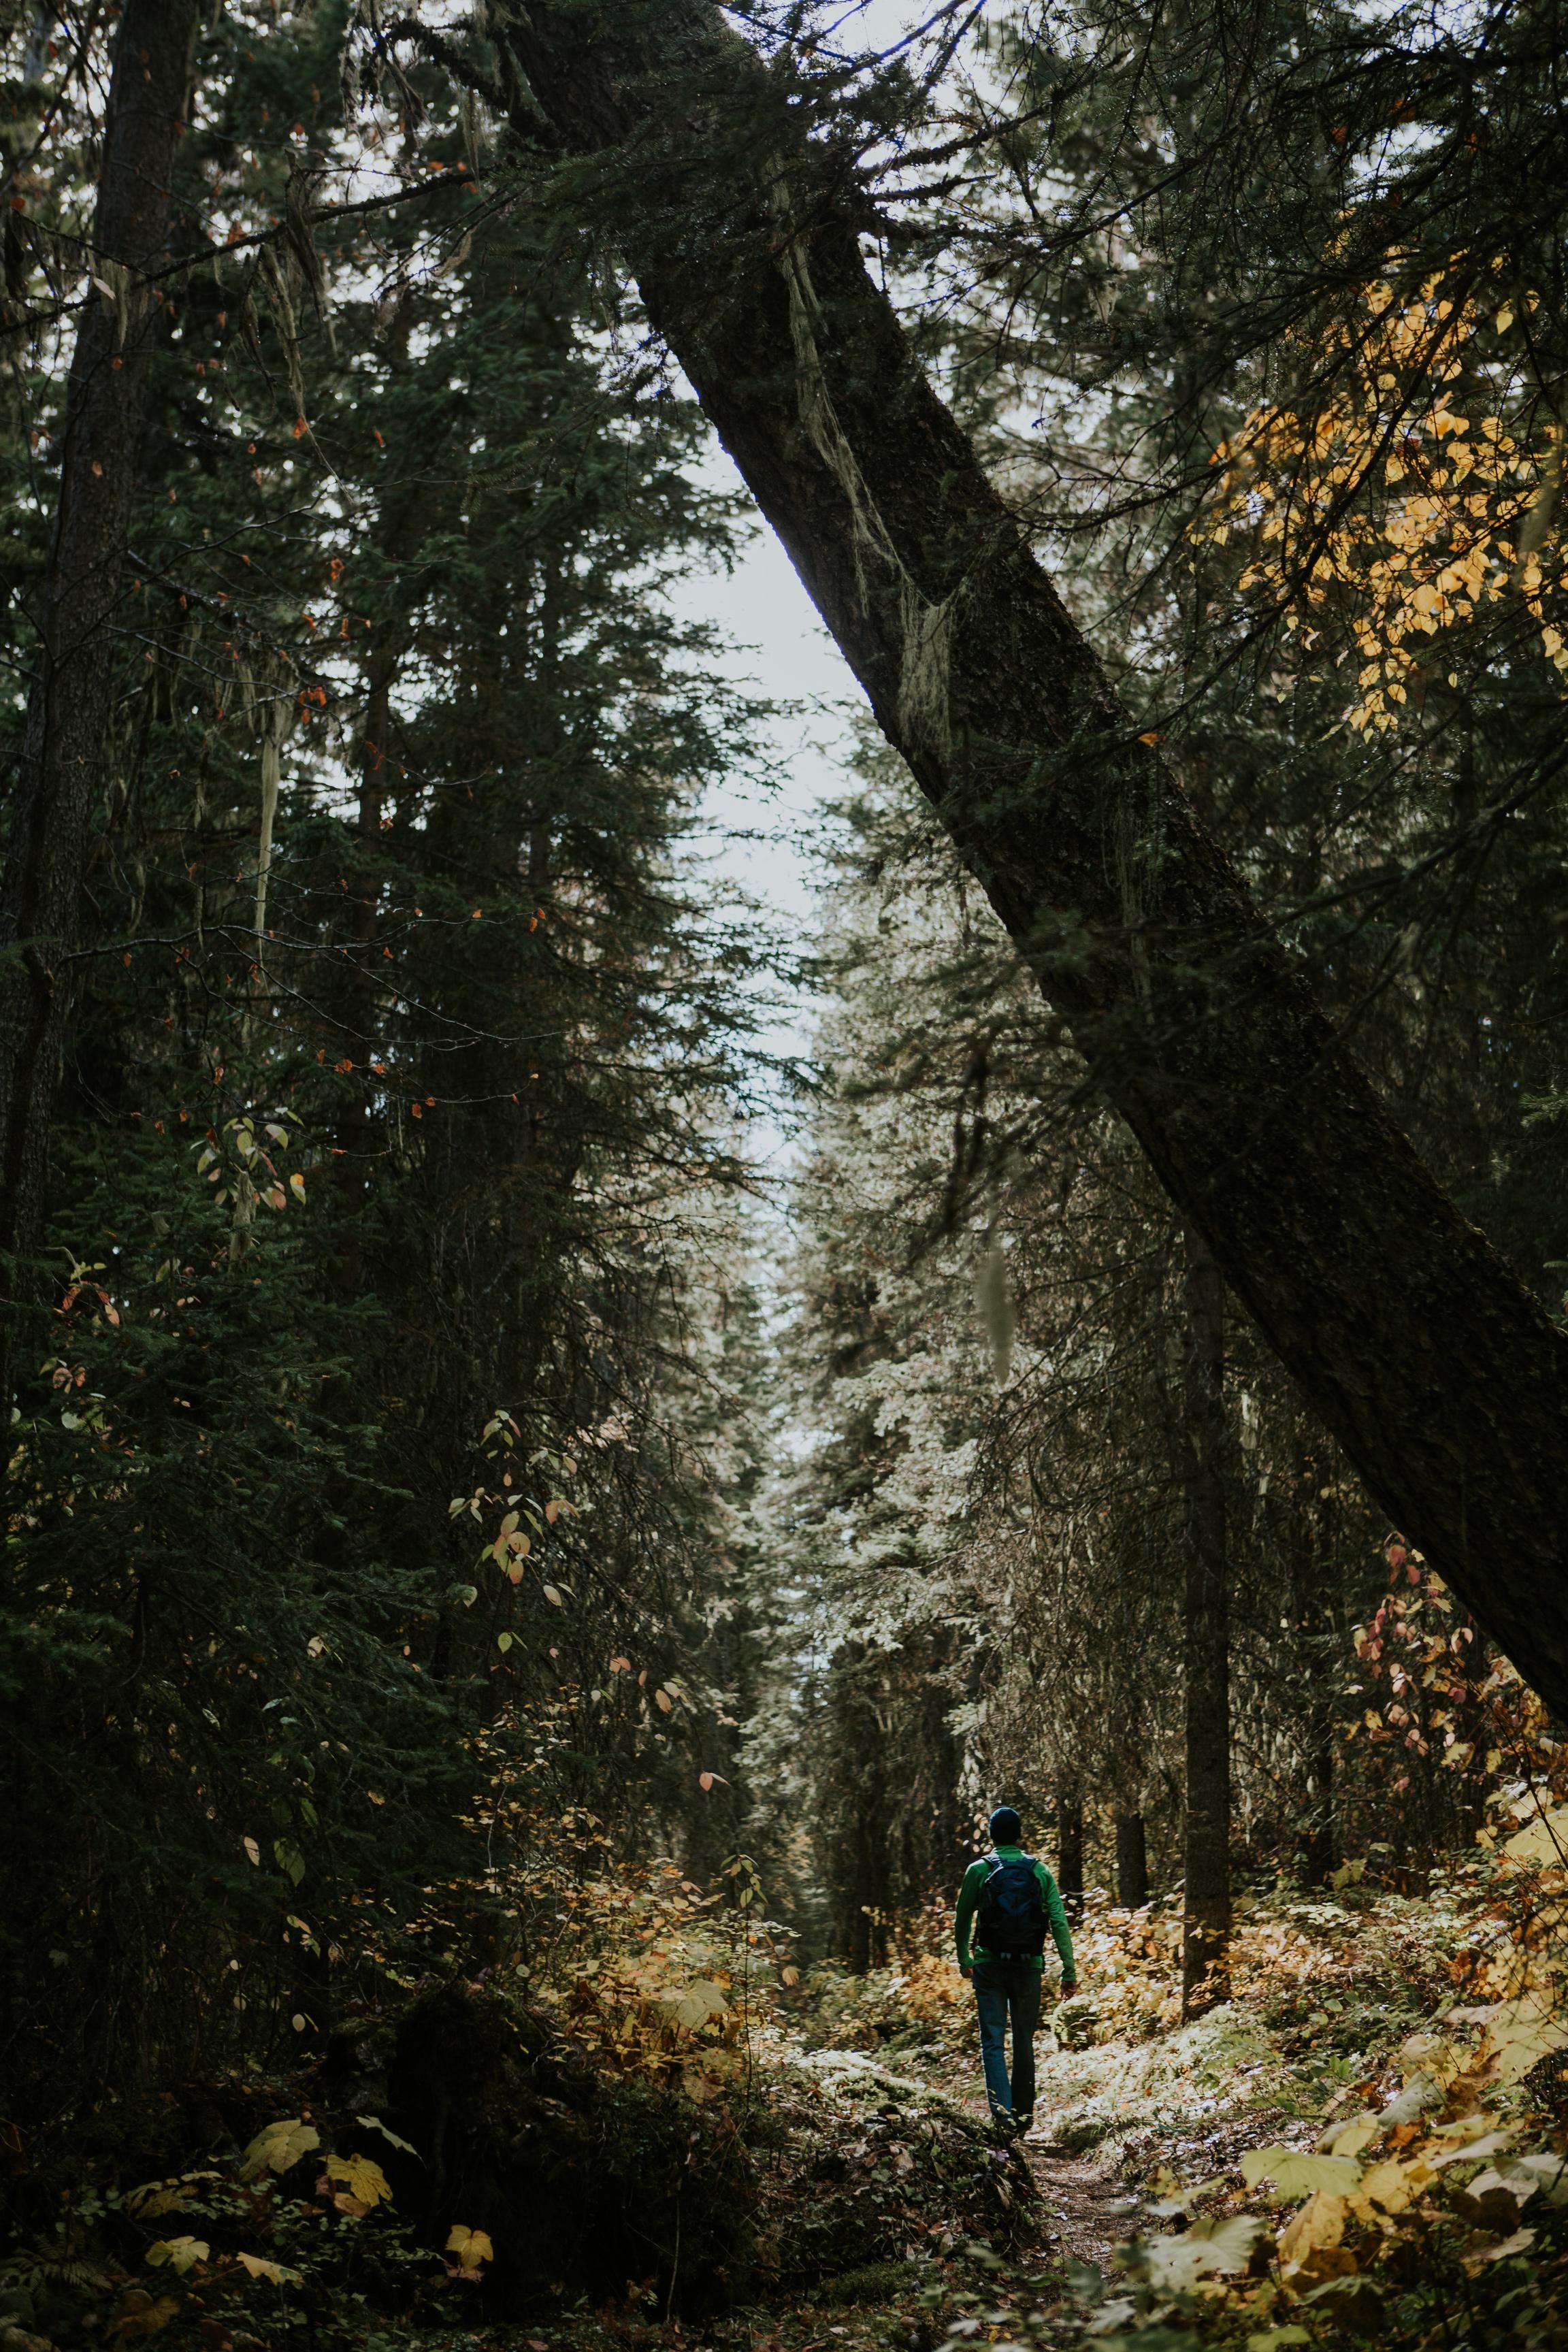 CindyGiovagnoli_outdoor_adventure_photography_Grand_Teton_Yellowstone_Glacier_National_Park_Montana_Wyoming_South_Dakota_Mount_Rushmore_Badlands-010.jpg